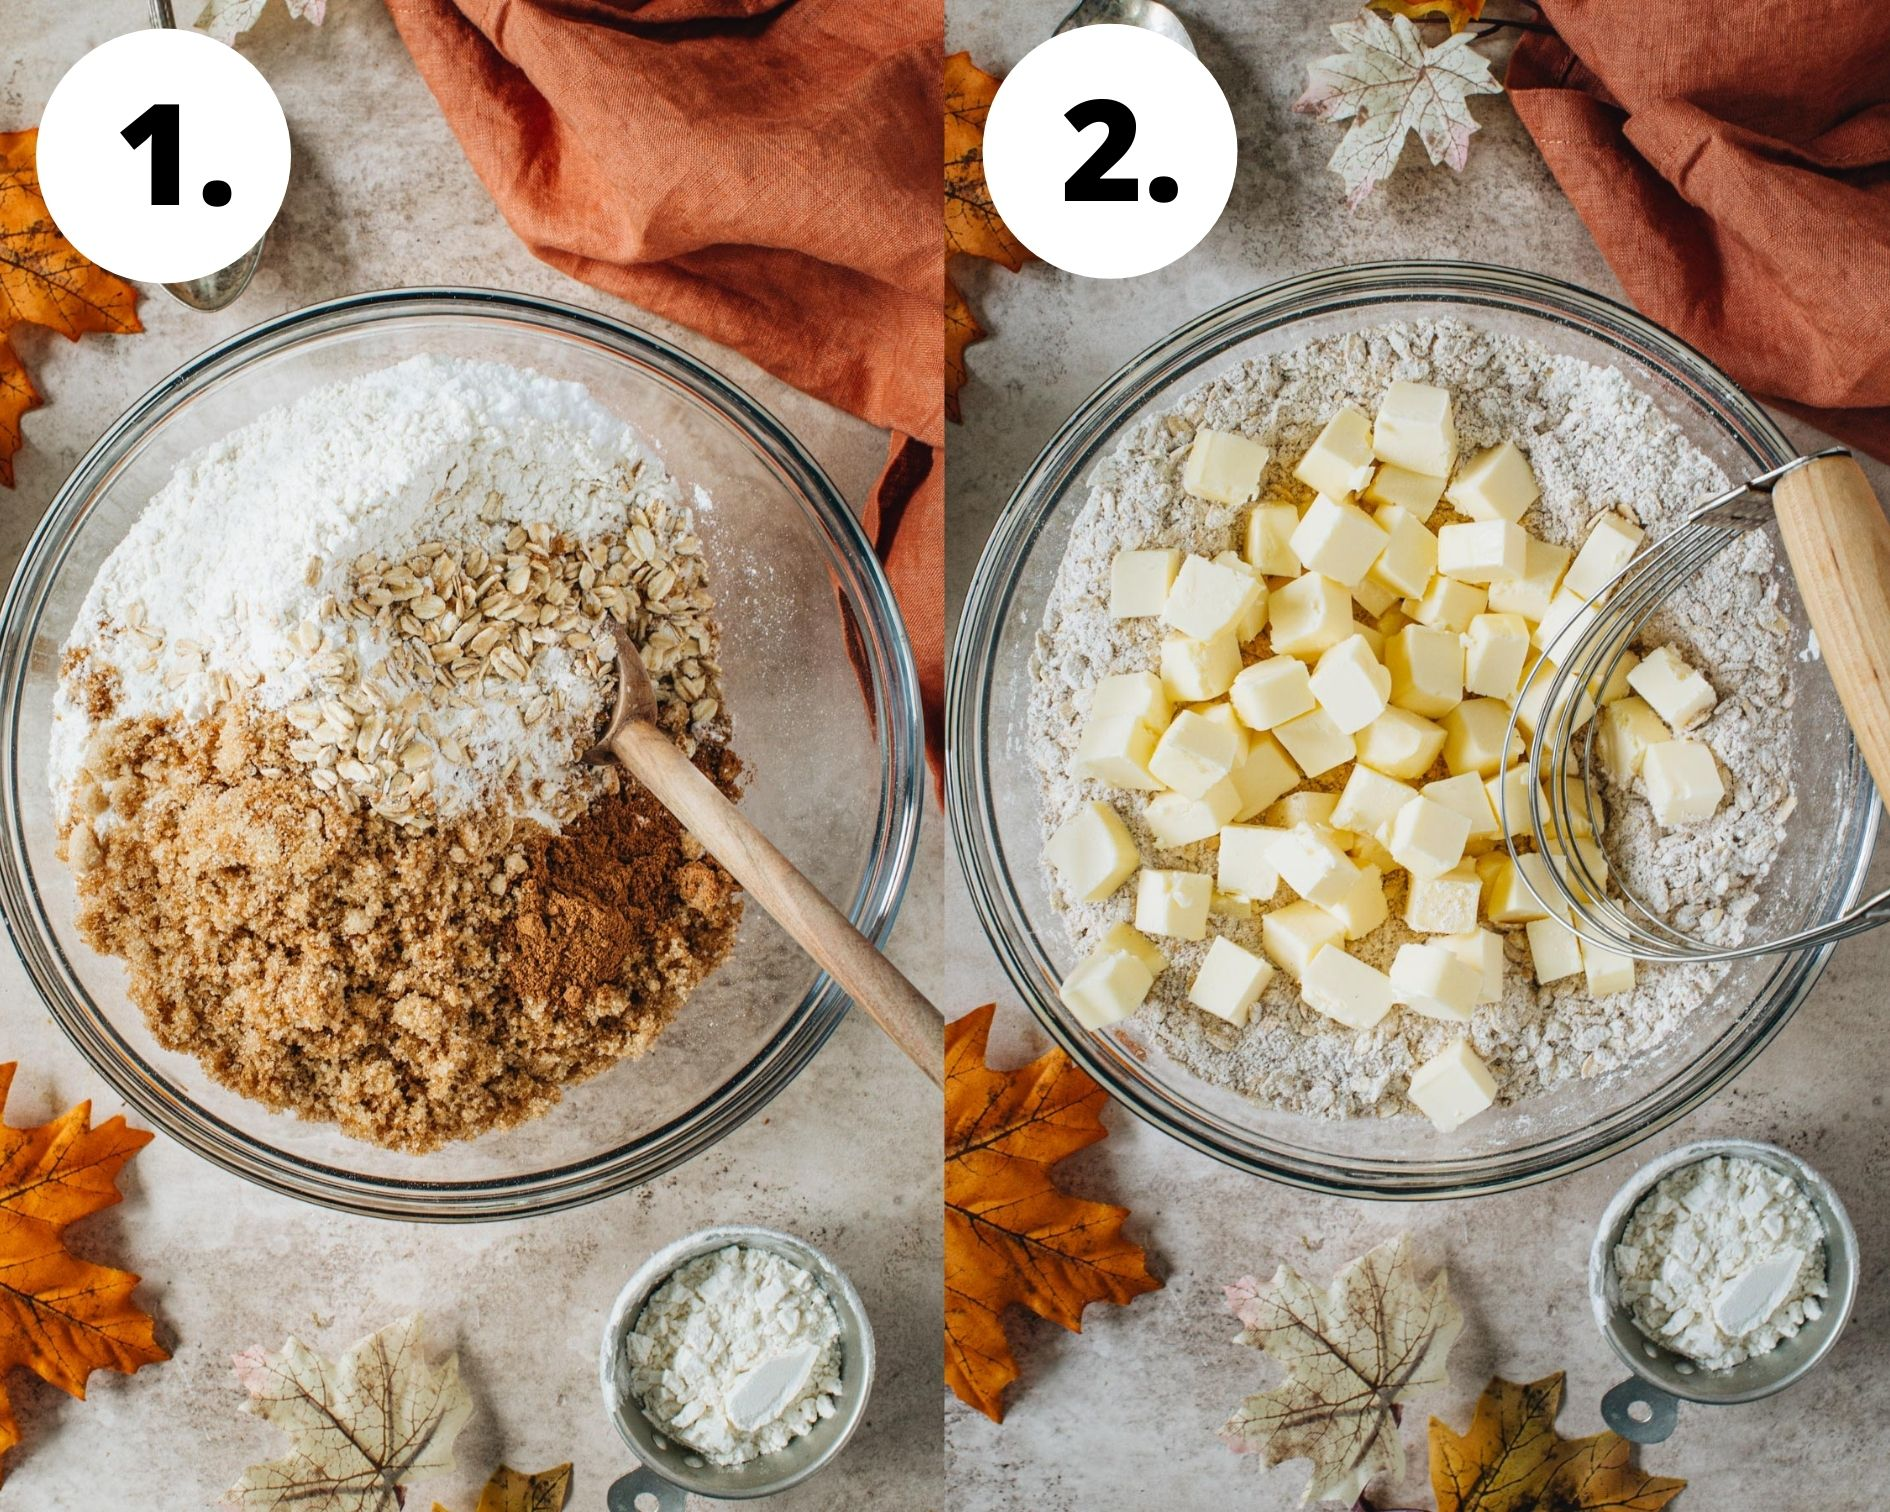 Pumpkin crisp process steps 1 and 2.